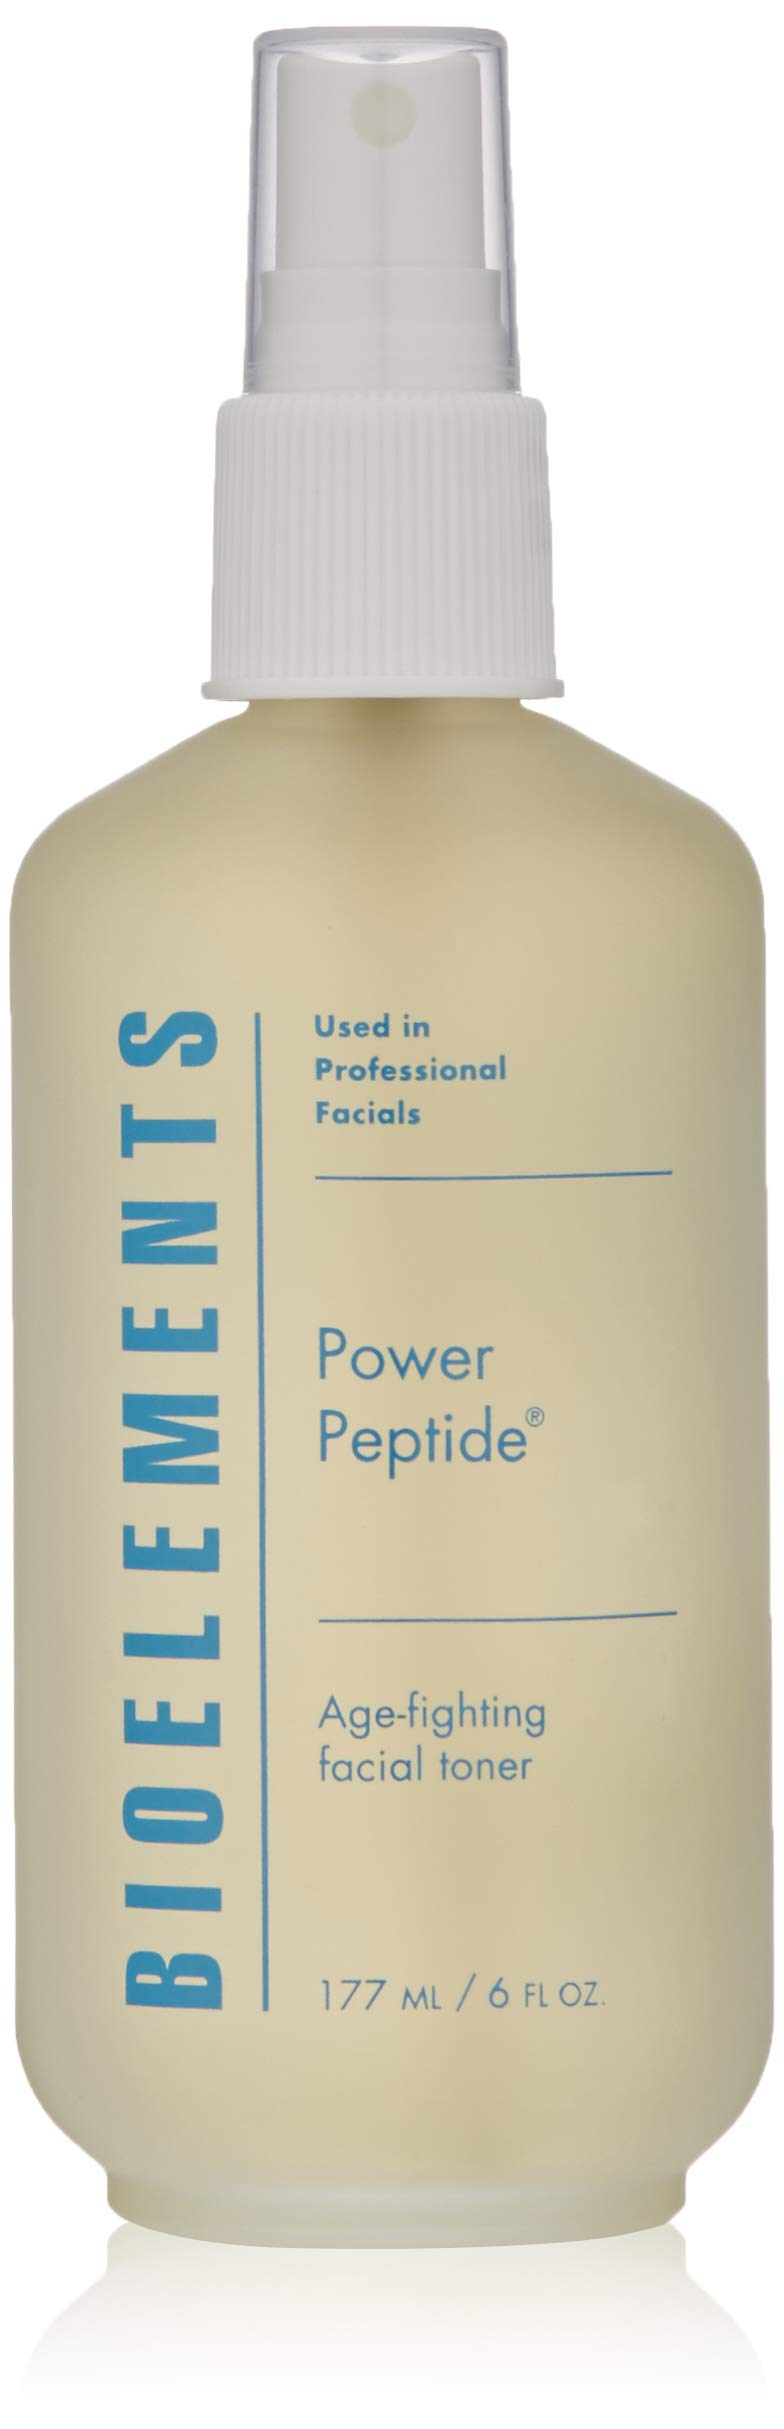 Bioelements Power Peptide, 6-Ounce